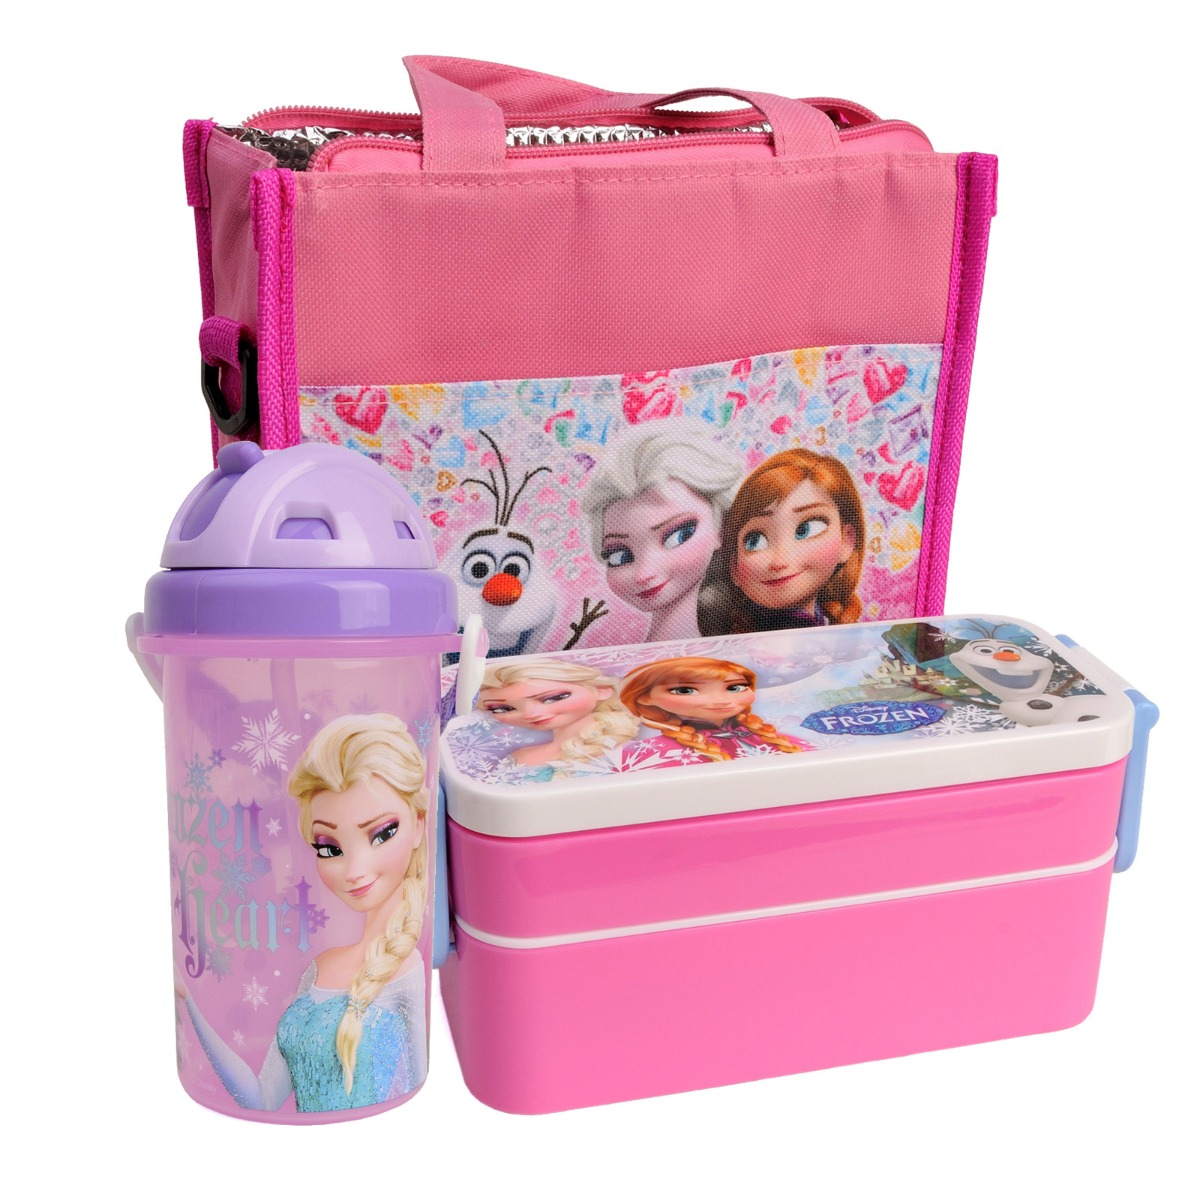 disney frozen girls kids school picnic insulated lunch box. Black Bedroom Furniture Sets. Home Design Ideas